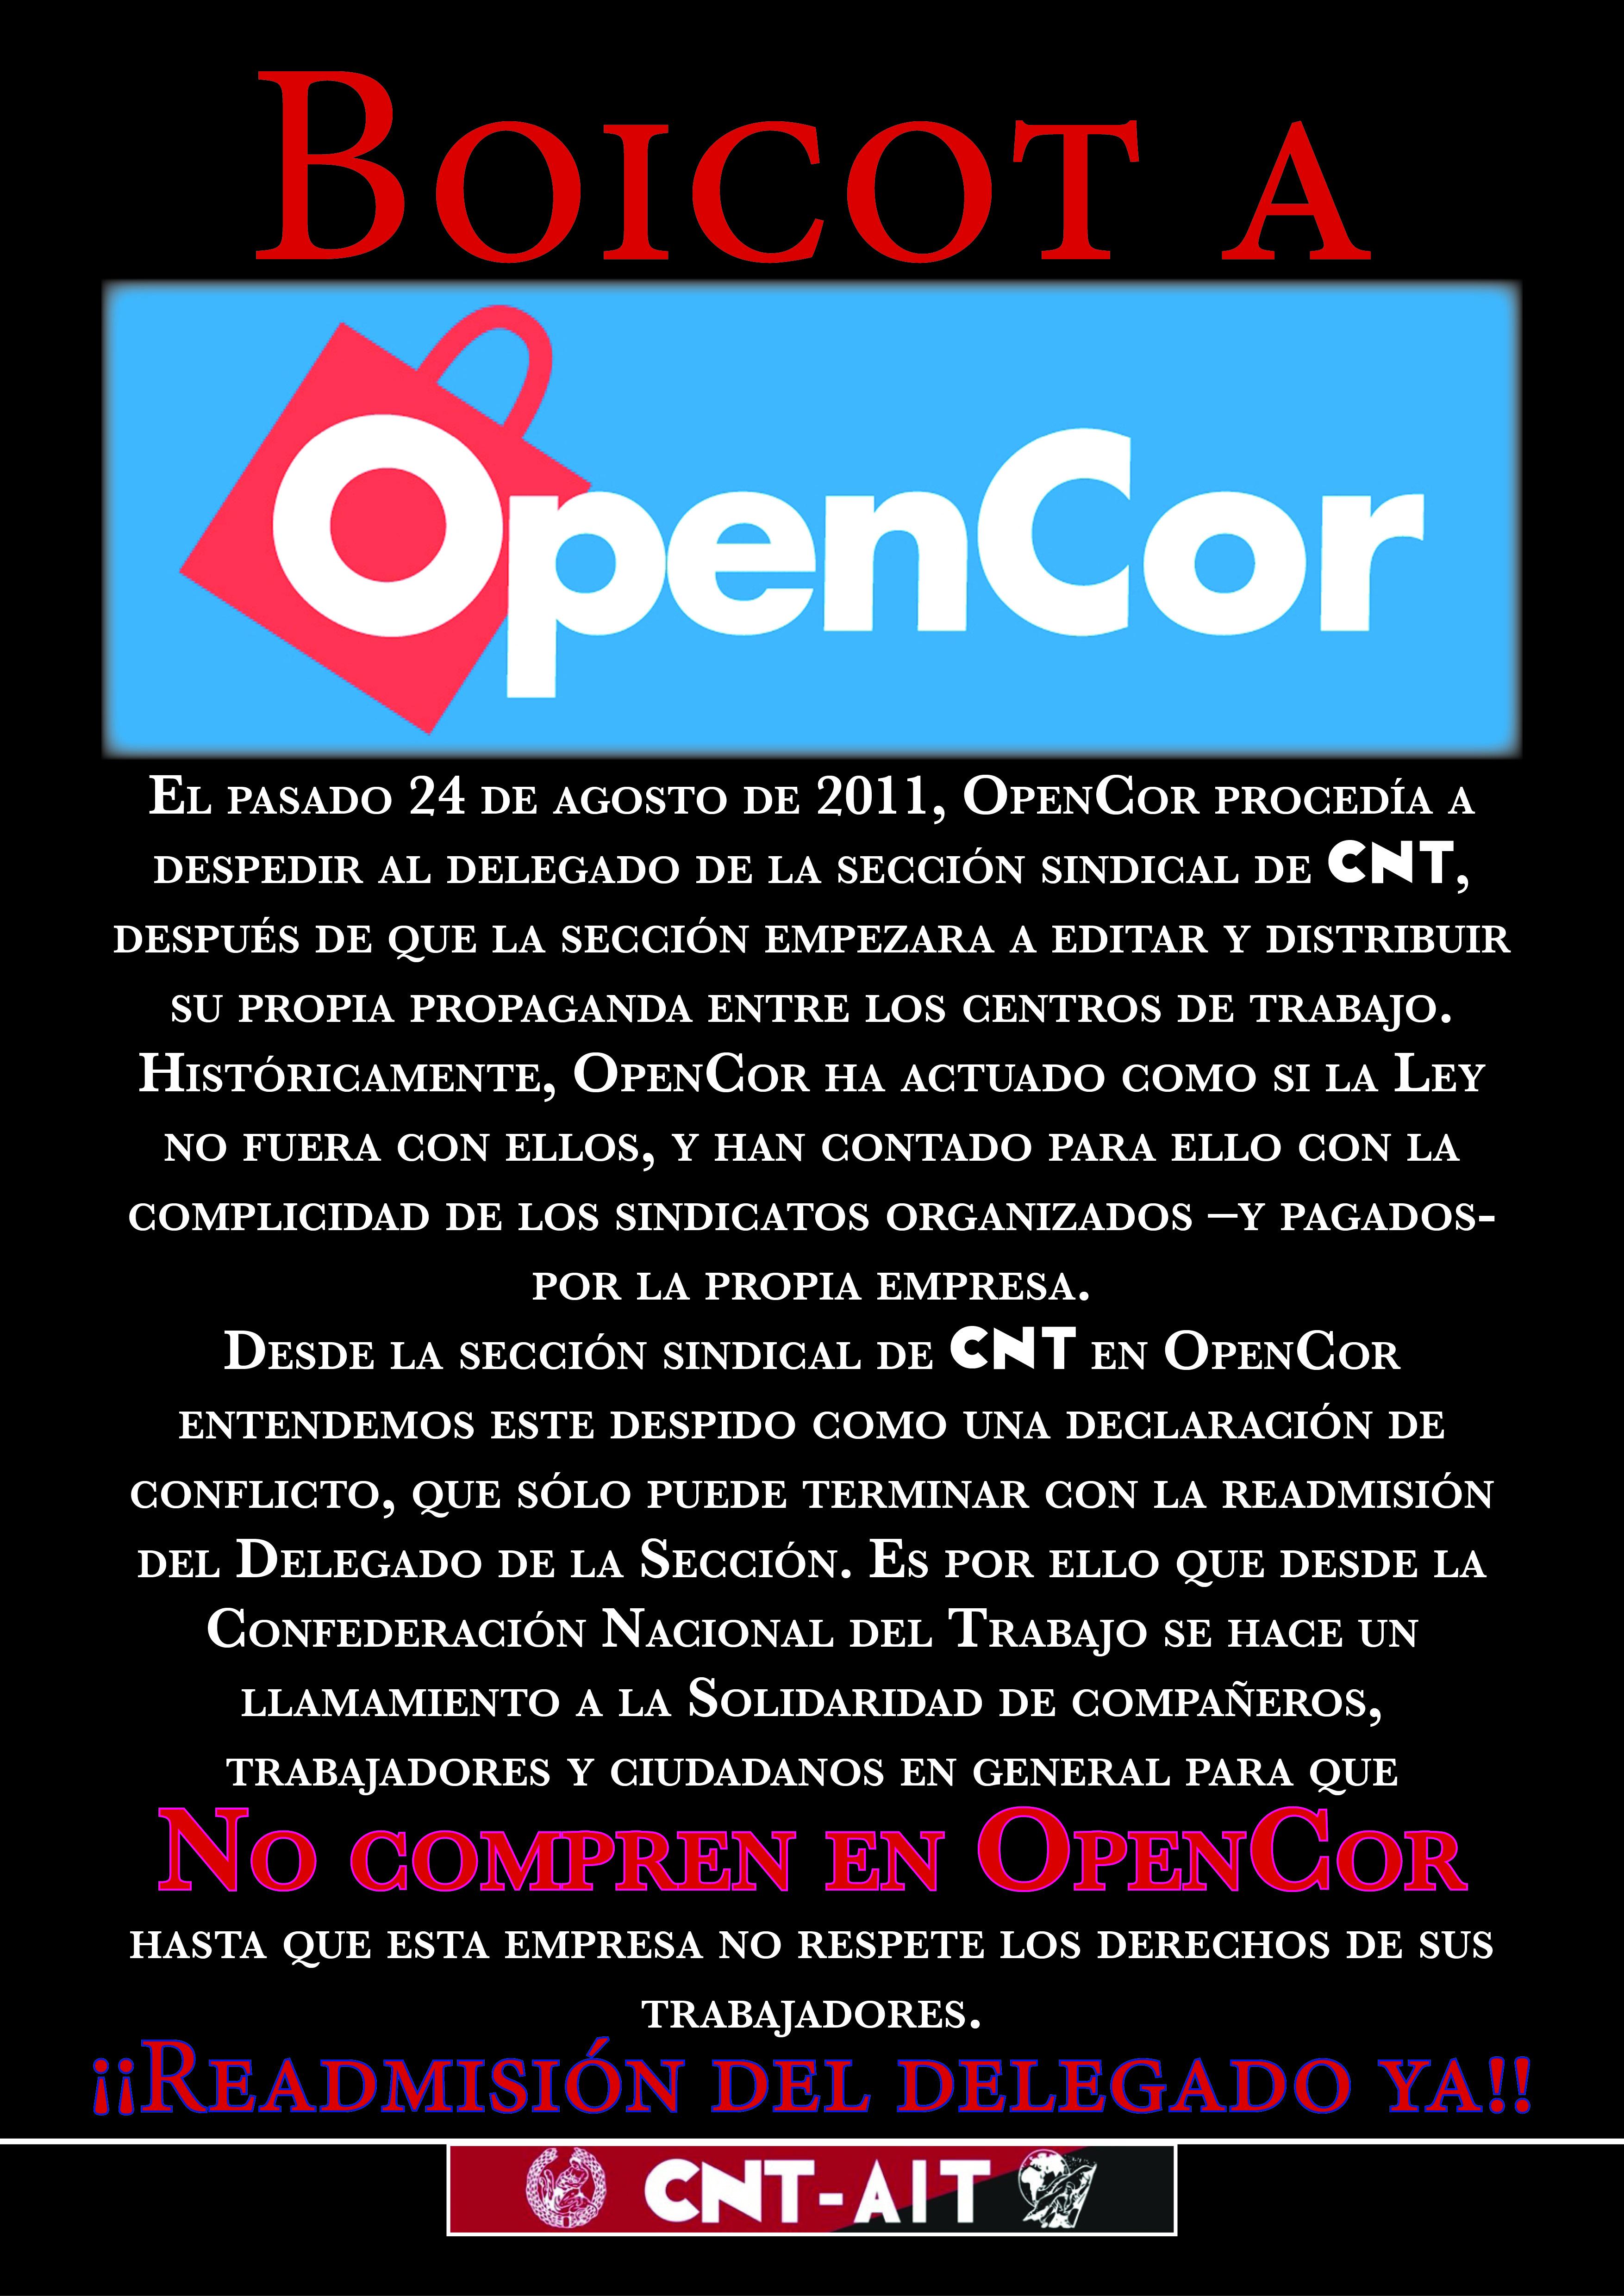 Boicot a Opencor